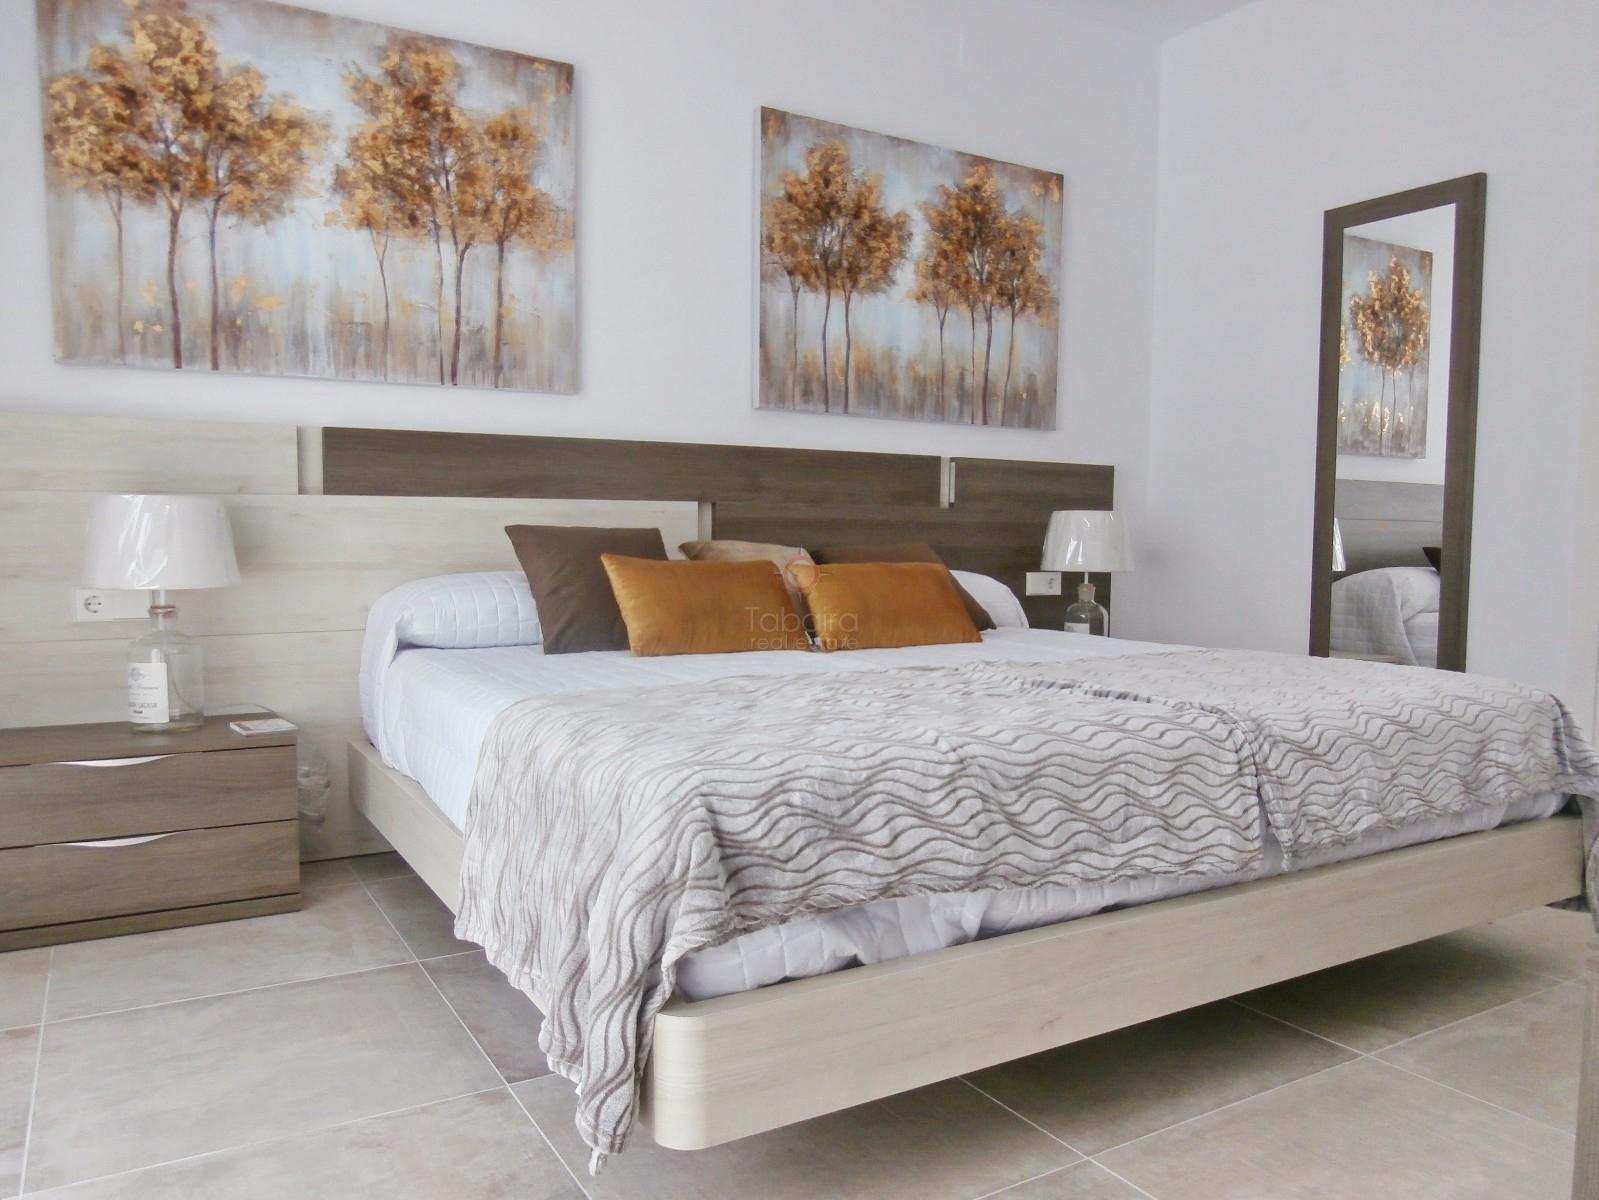 Sale villas moraira moraira for Homes for sale under 50 000 near me